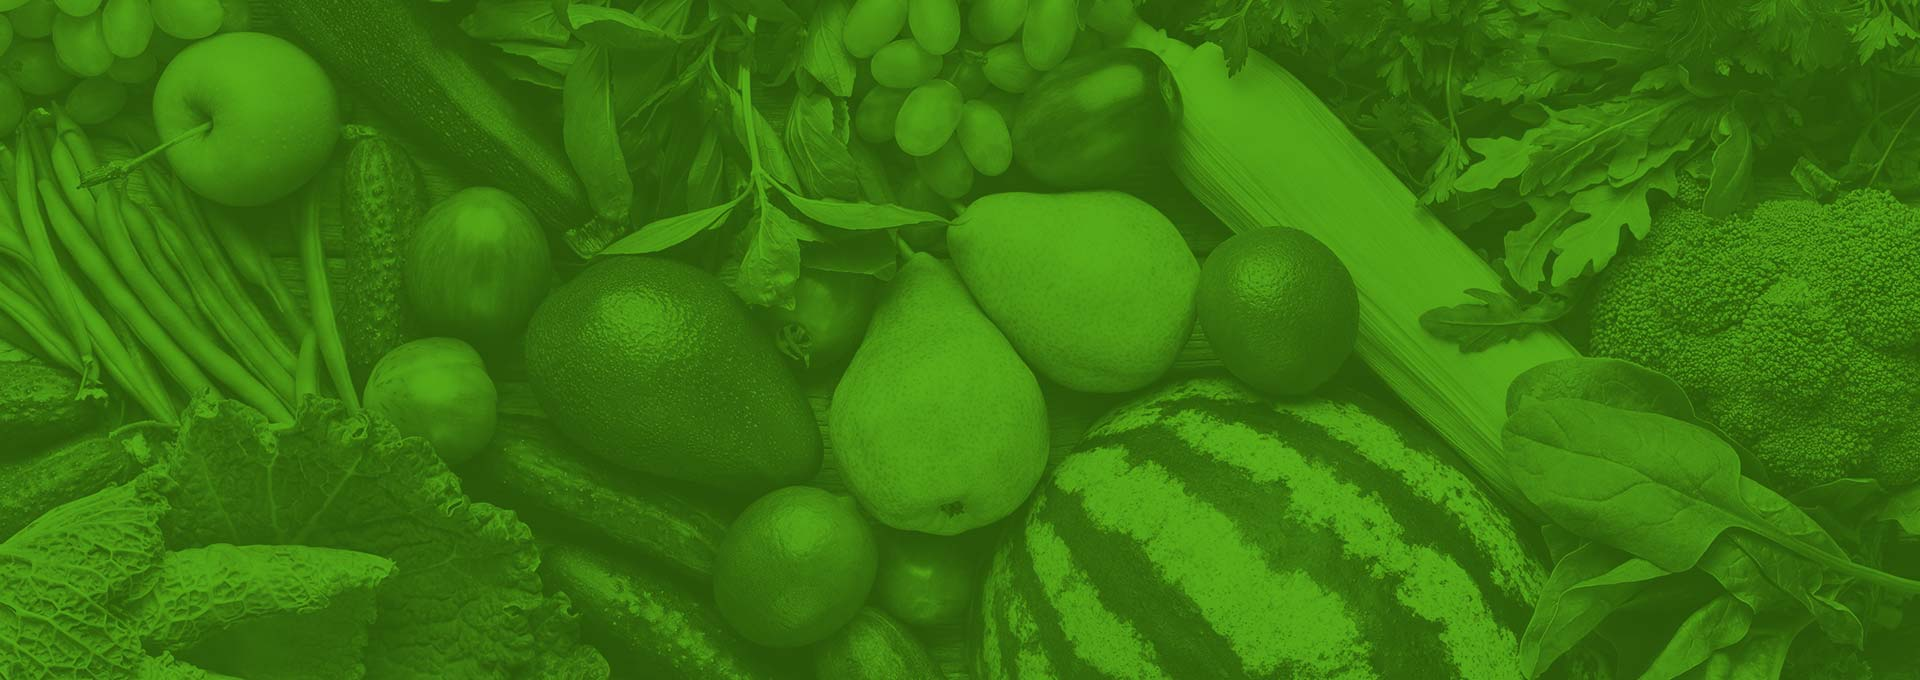 Loffredo Fresh Produce – Providing Safe, Healthy Food for 125 Years